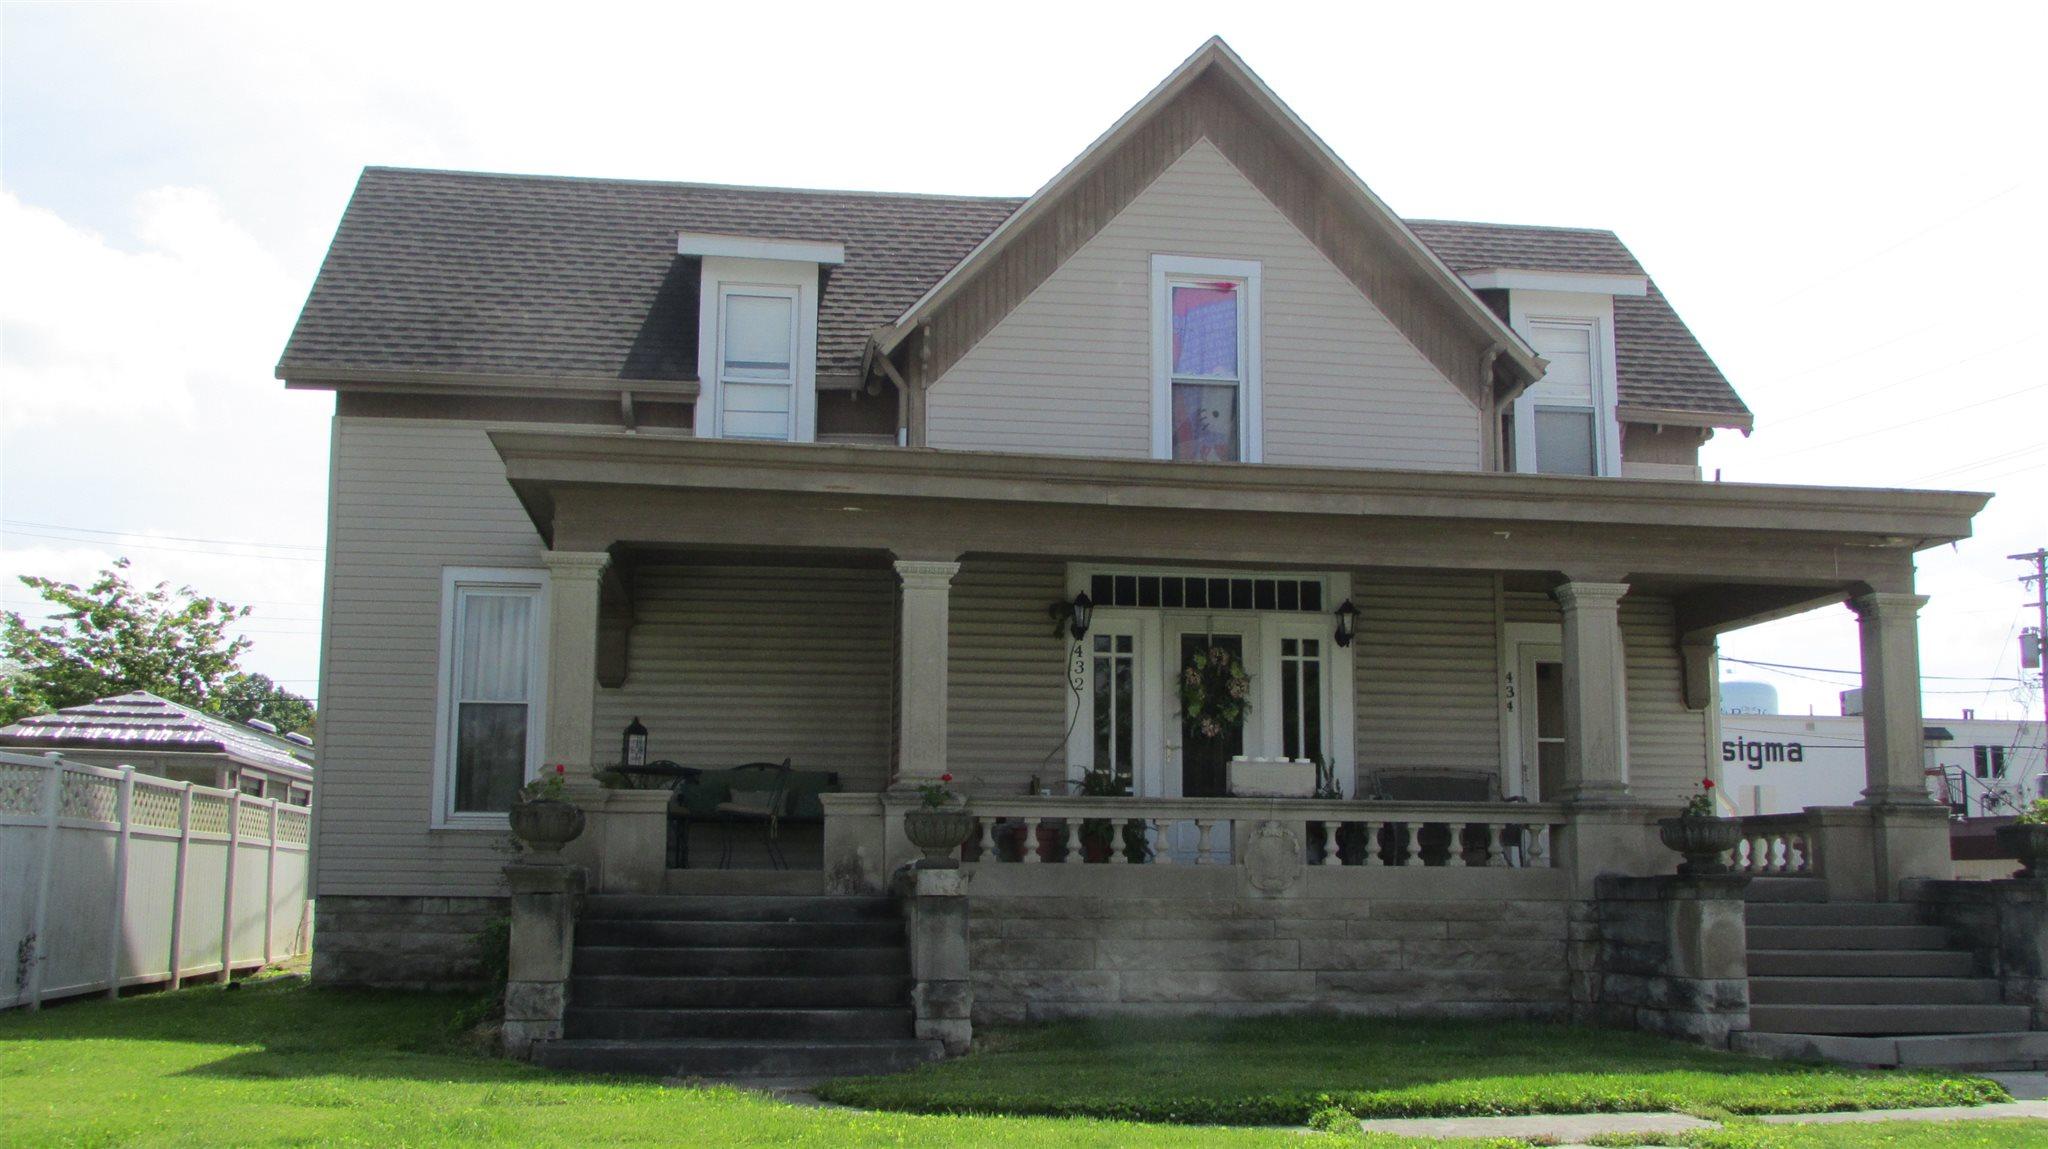 432 & 434 M Street Bedford, IN 47421